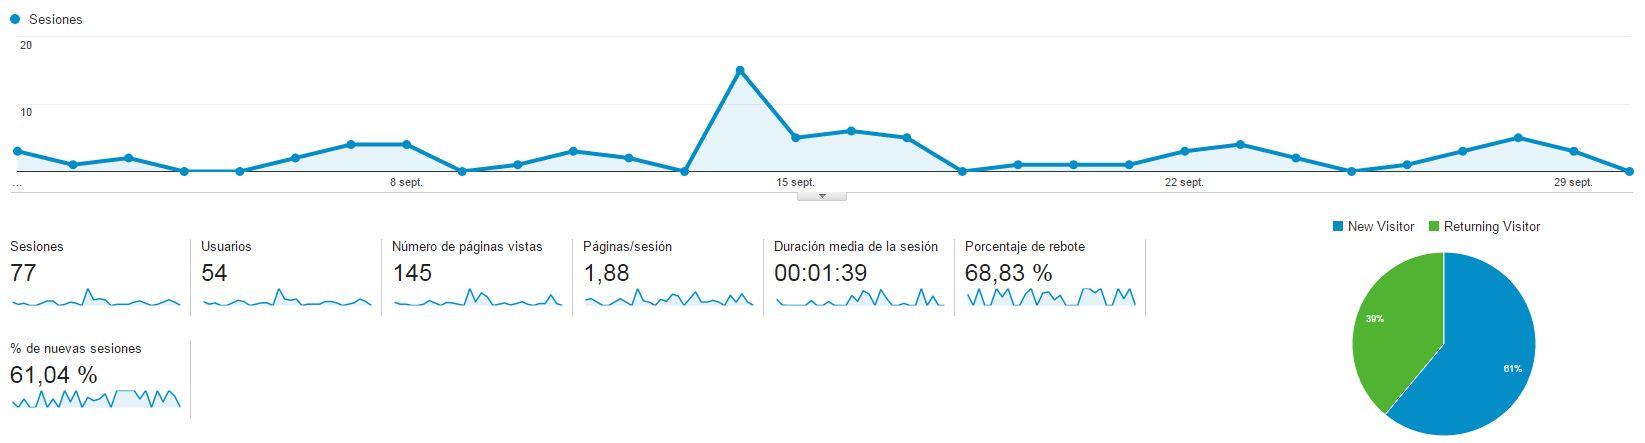 Analytics Septiembre 2015